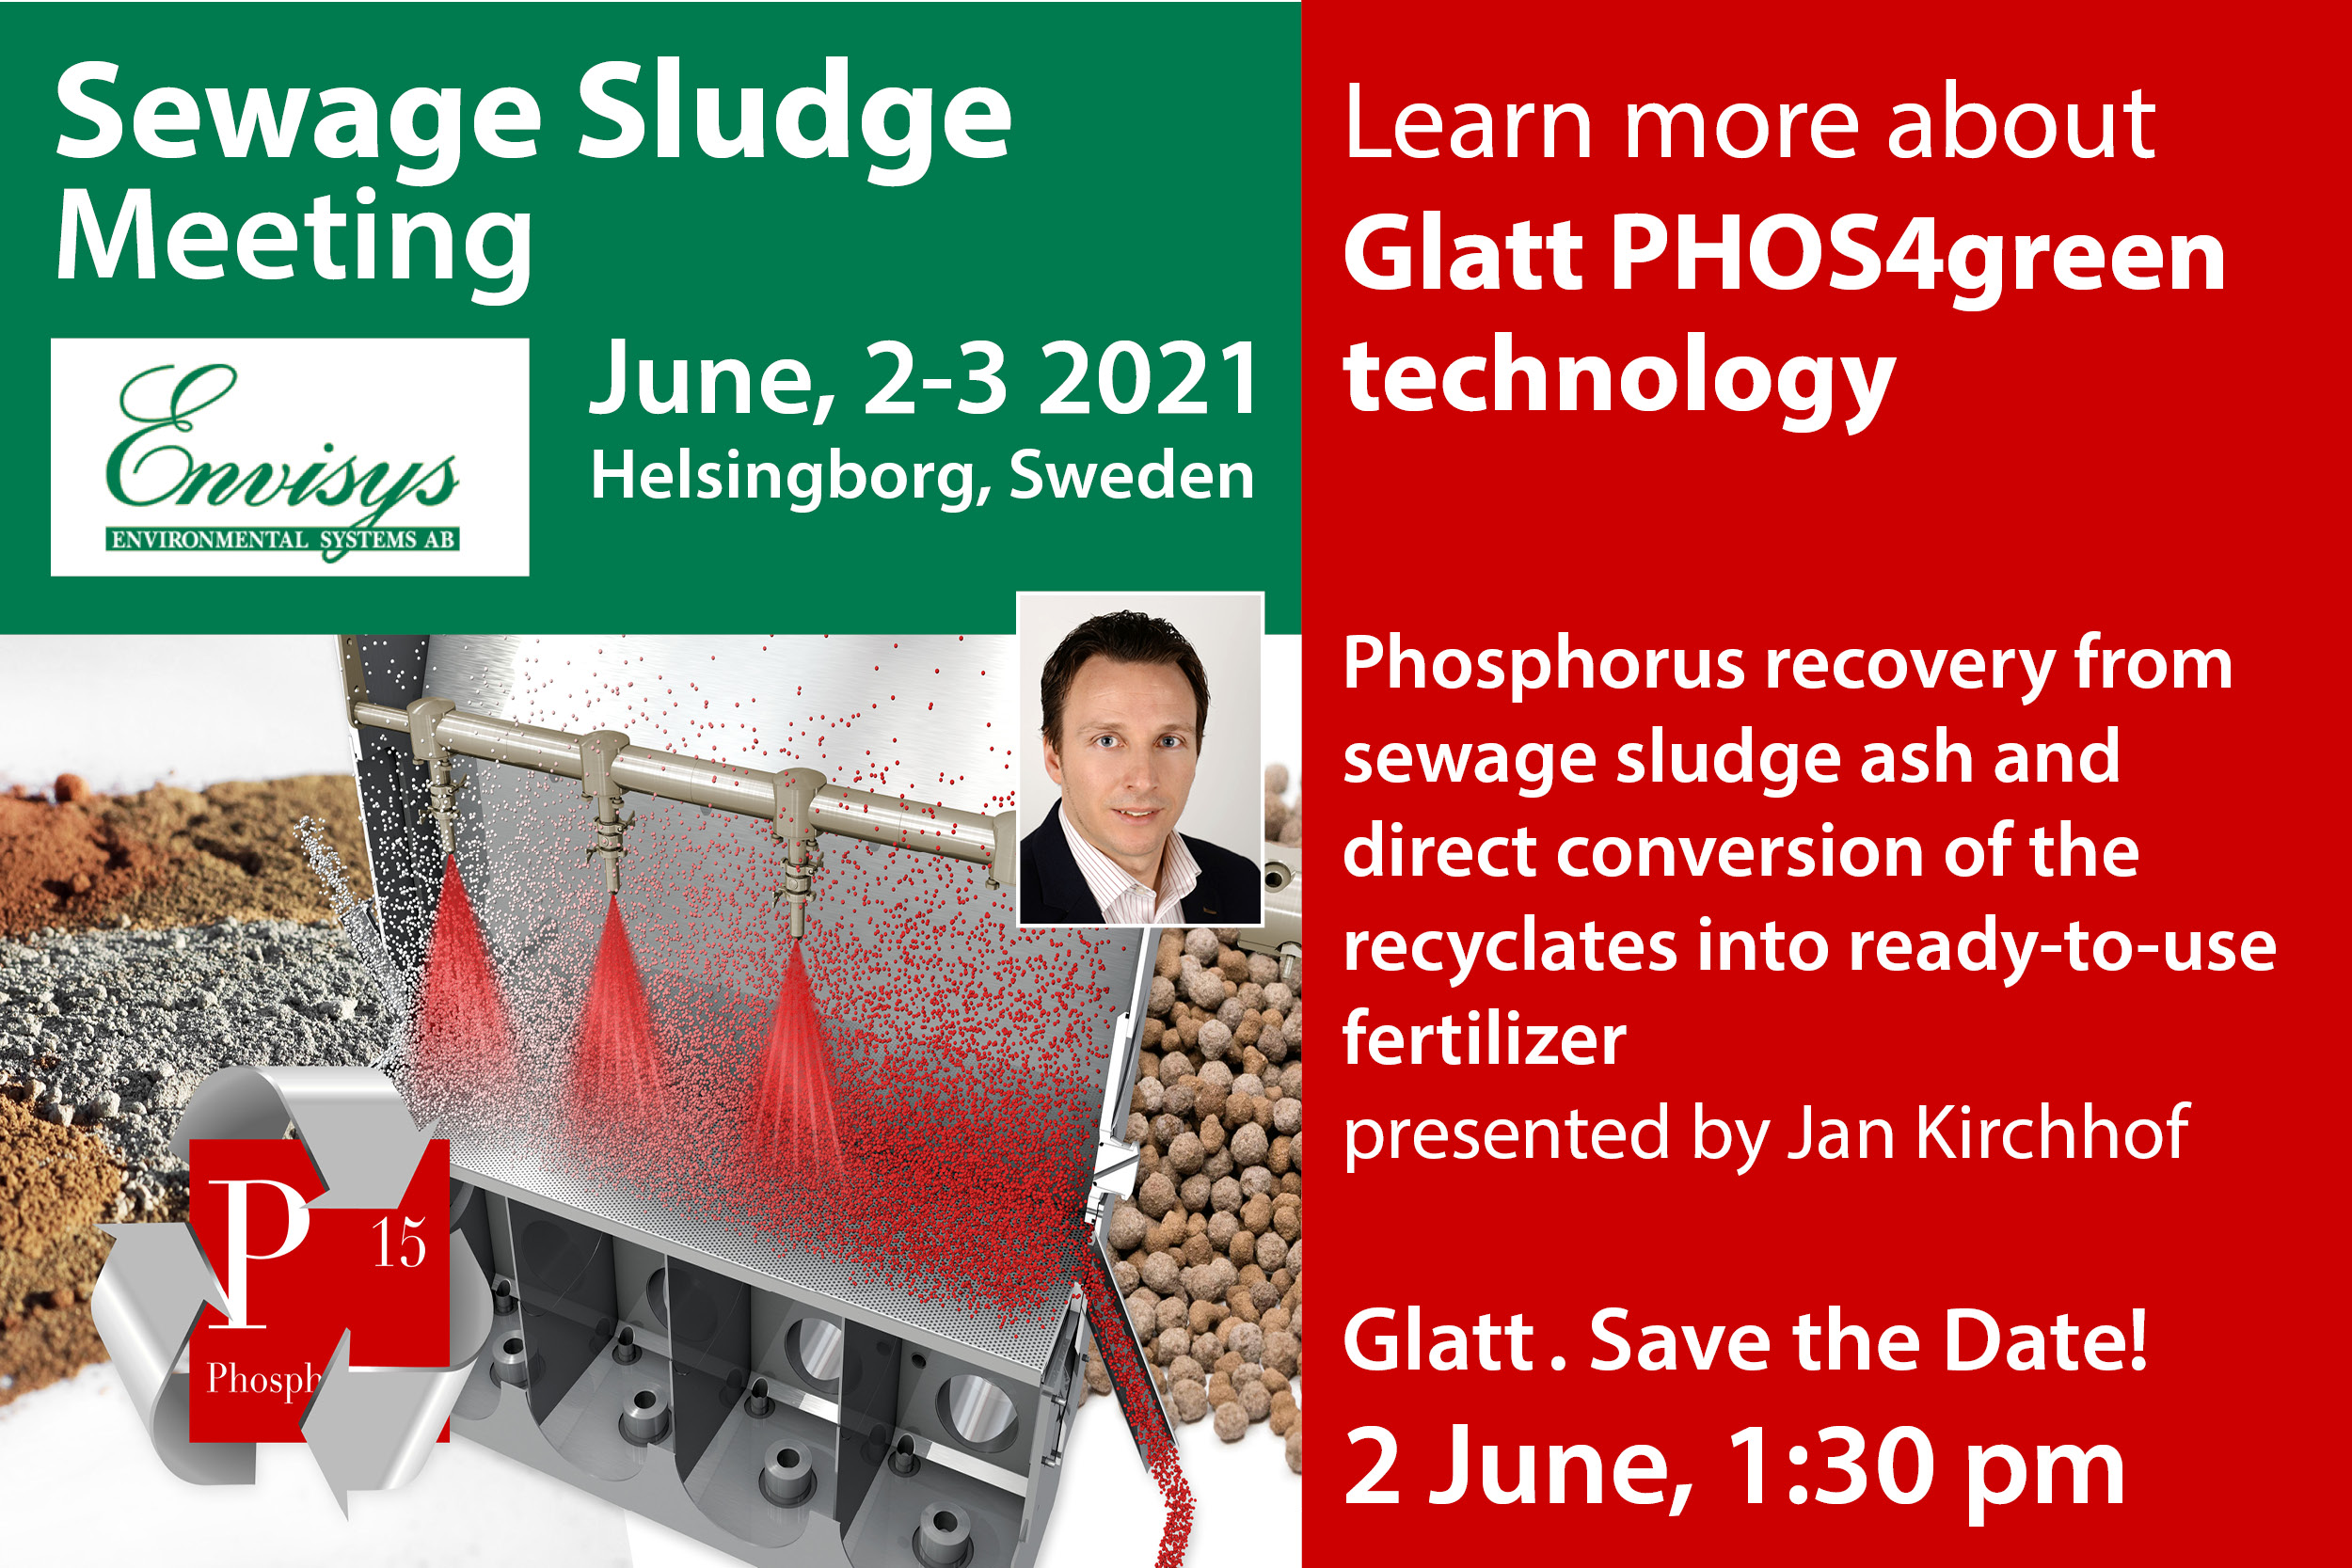 Glatt@Sewage-Sludge-Meeting-Sweden_2021